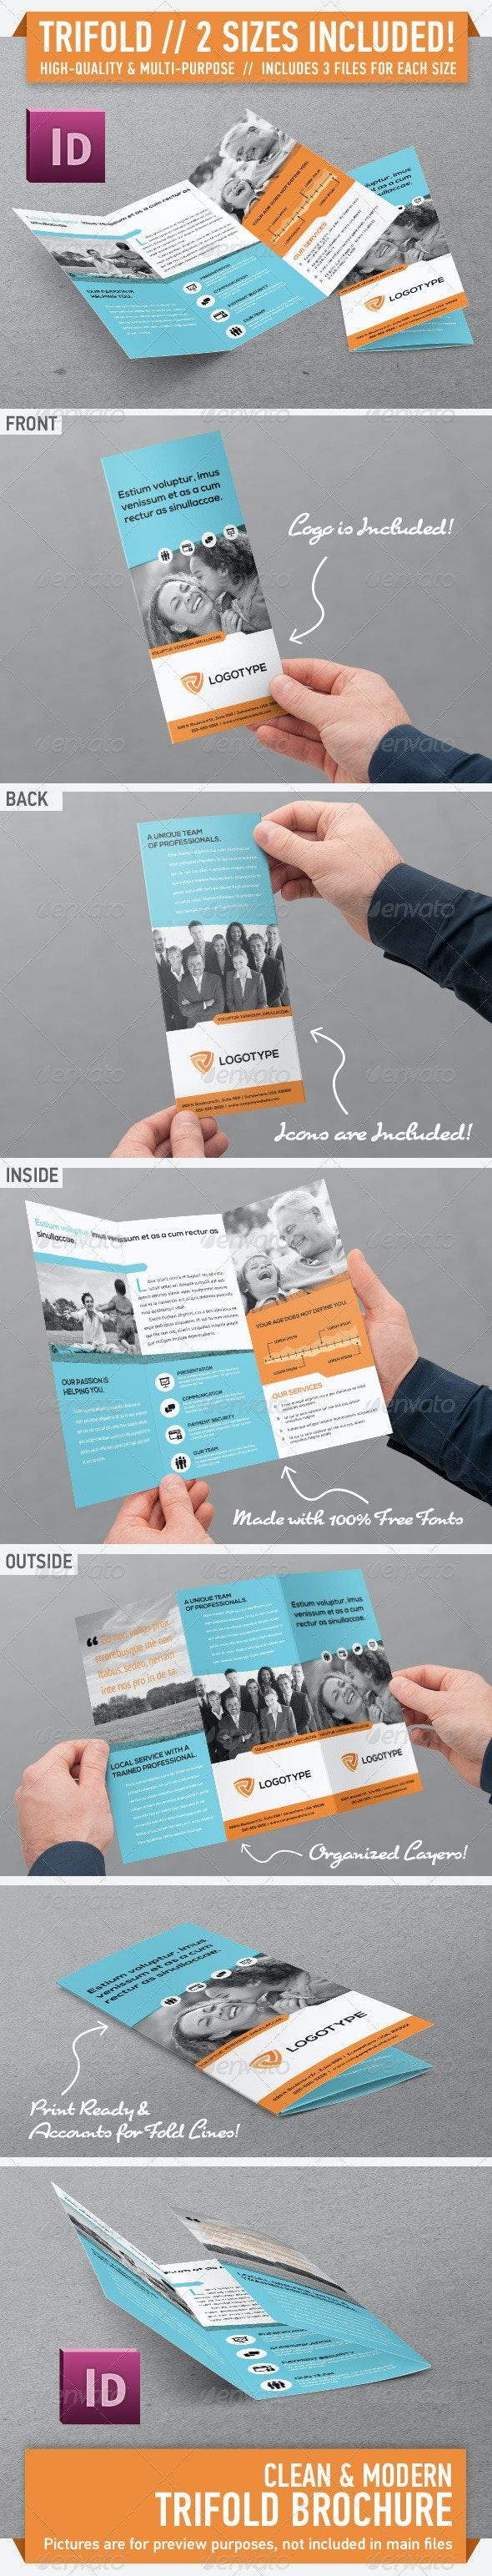 Clean Modern Trifold Brochure - Vol. 2 - Corporate Brochures